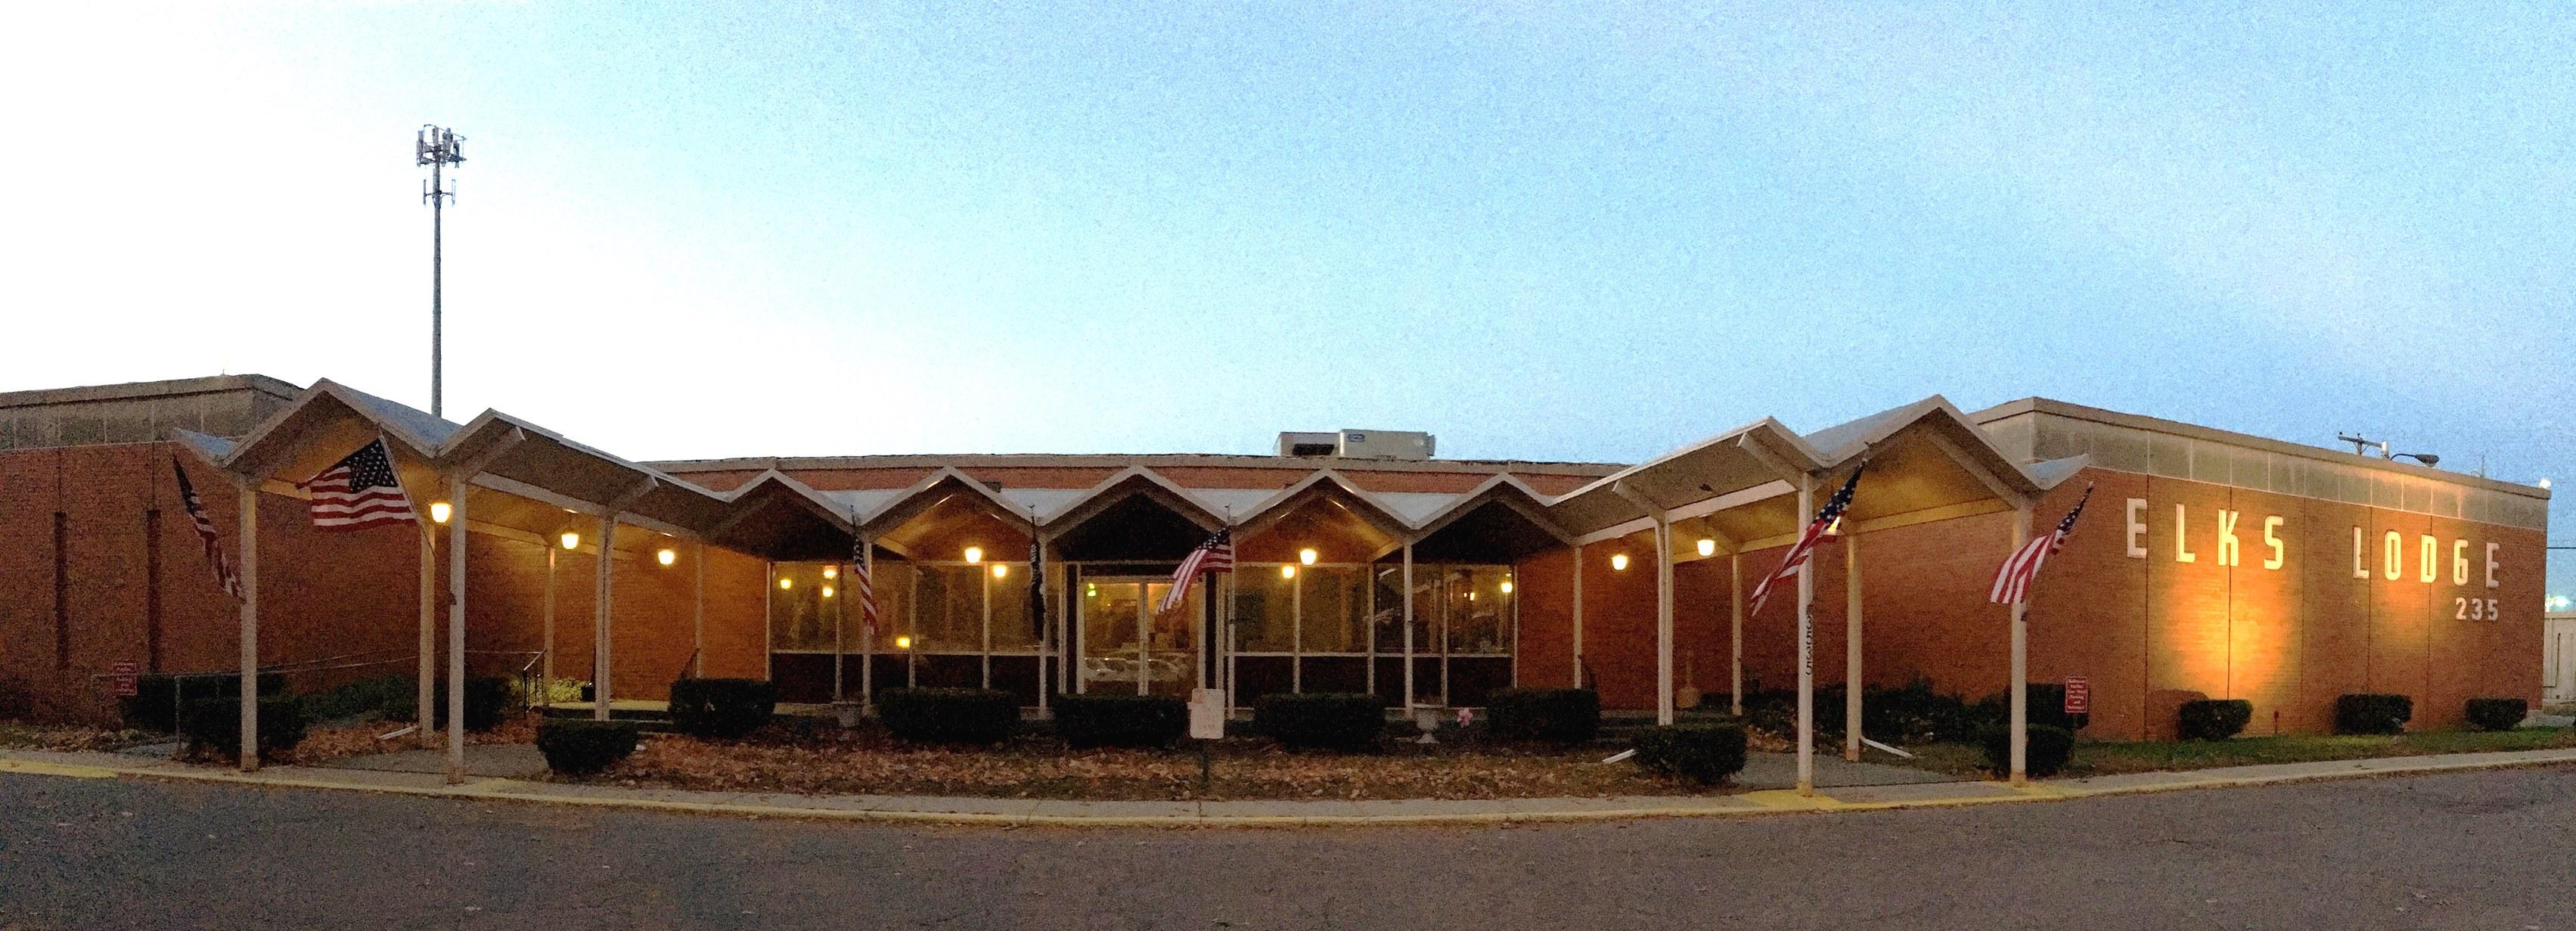 Elks Lodge 235 | Venue, South Bend | Get your price estimate